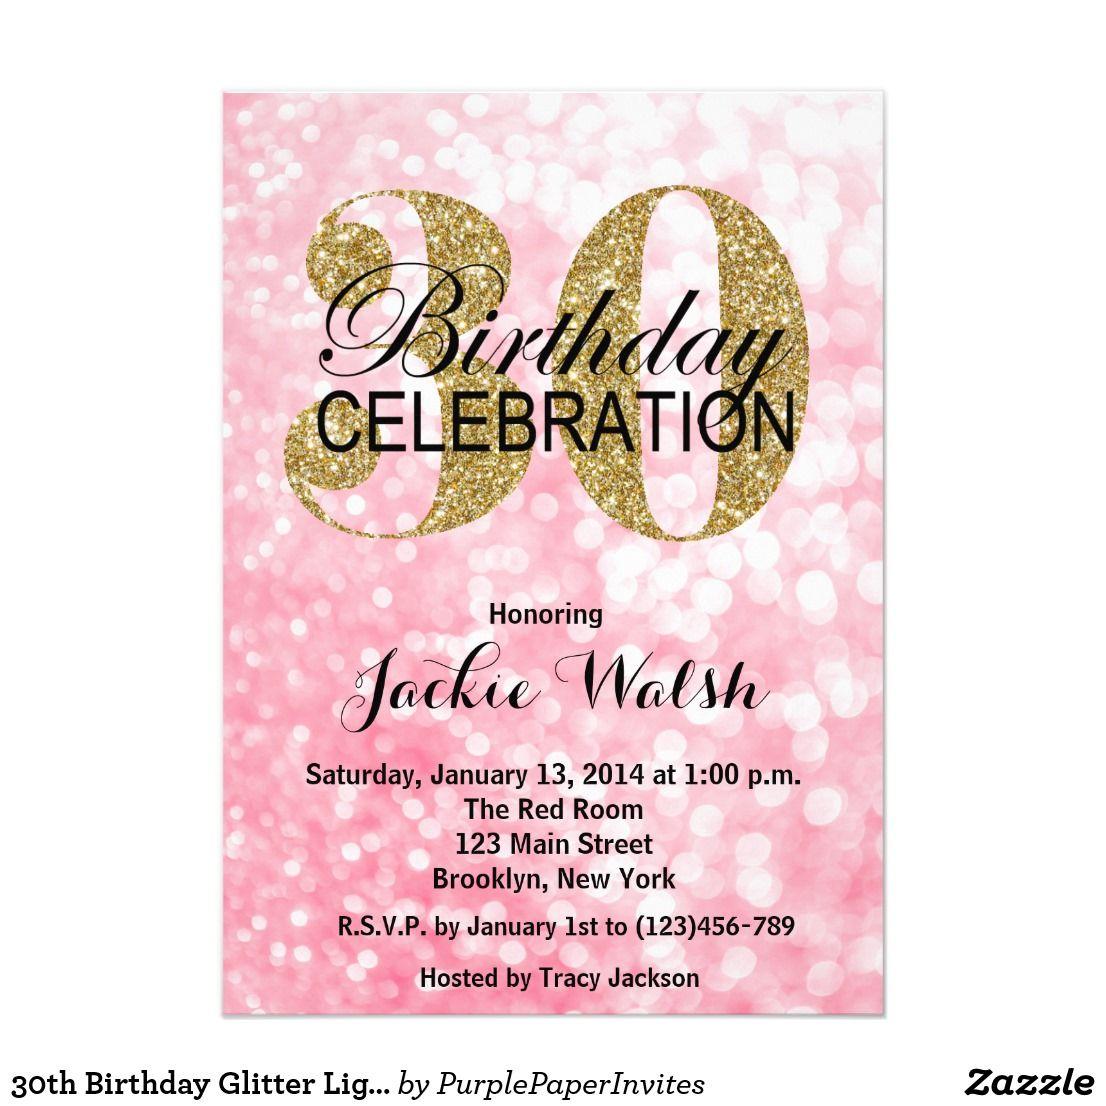 30th Birthday Glitter Lights Party Invitation | 30 birthday, Party ...